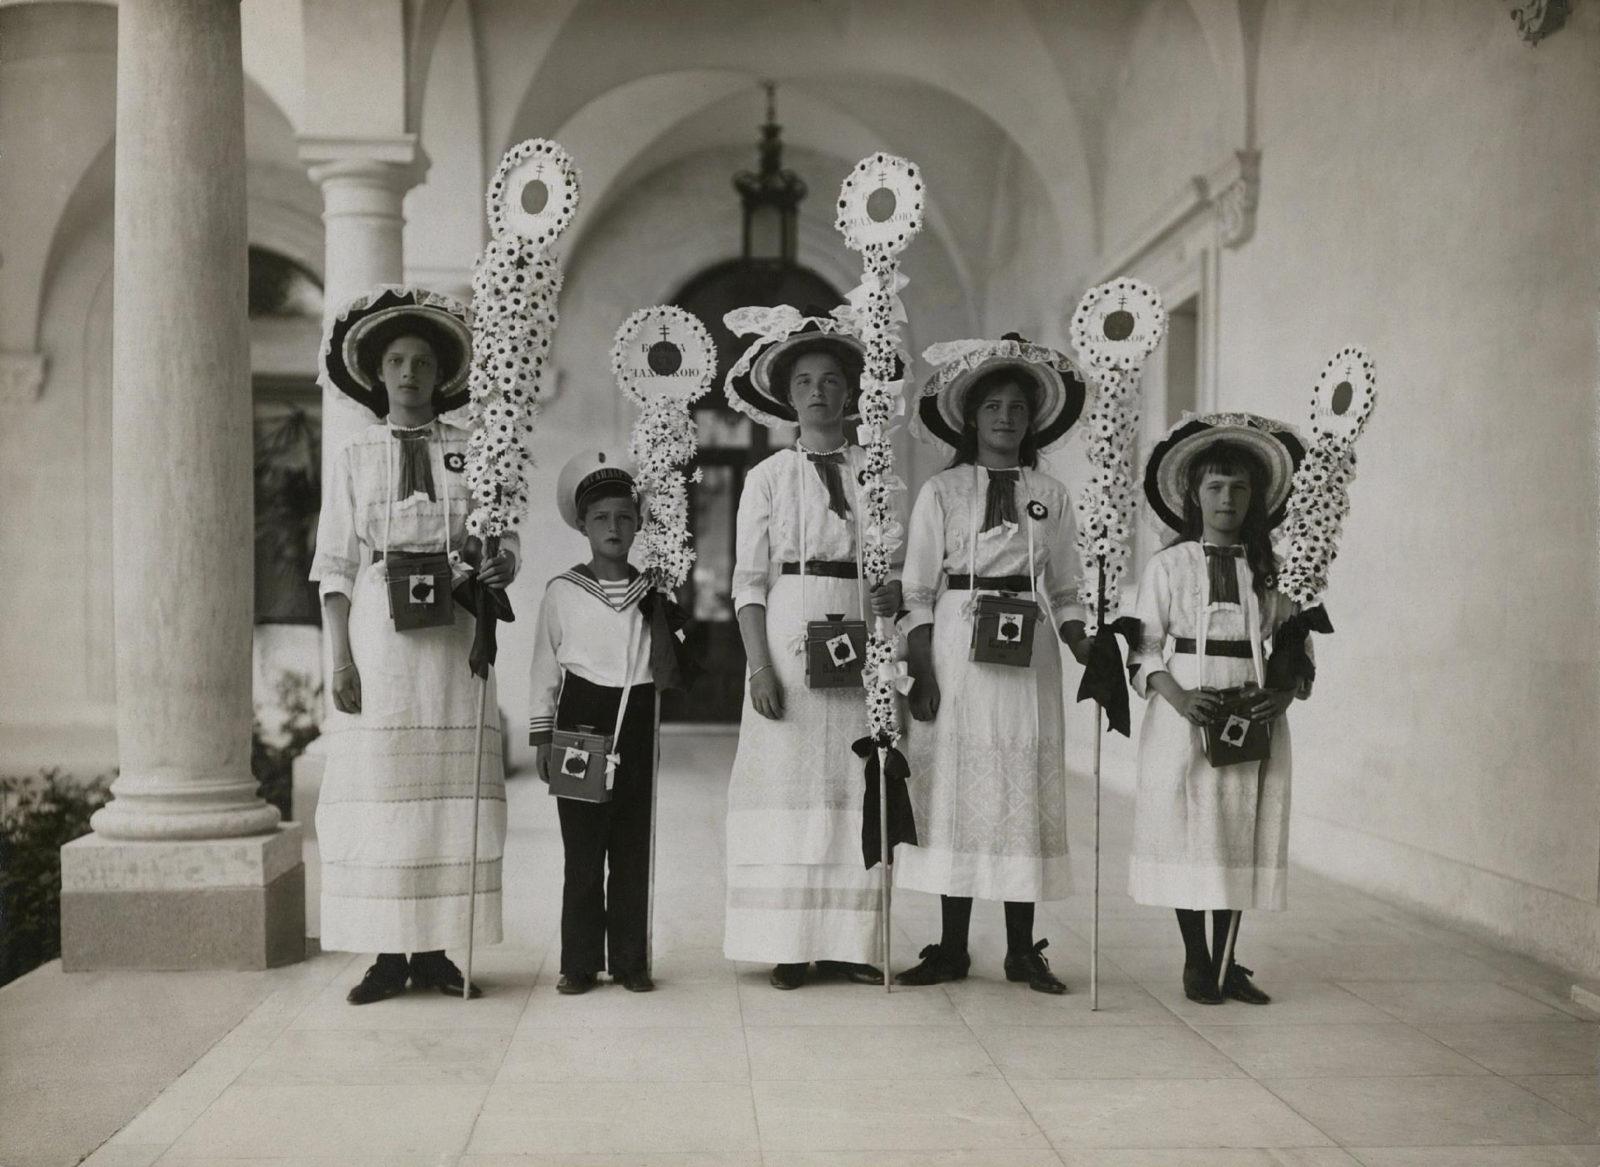 Tsarevich Alexei and Great Princes Olga, Tatiana, Maria and Anastasia. Festival of the White Flower. Livadia in the year 1912.